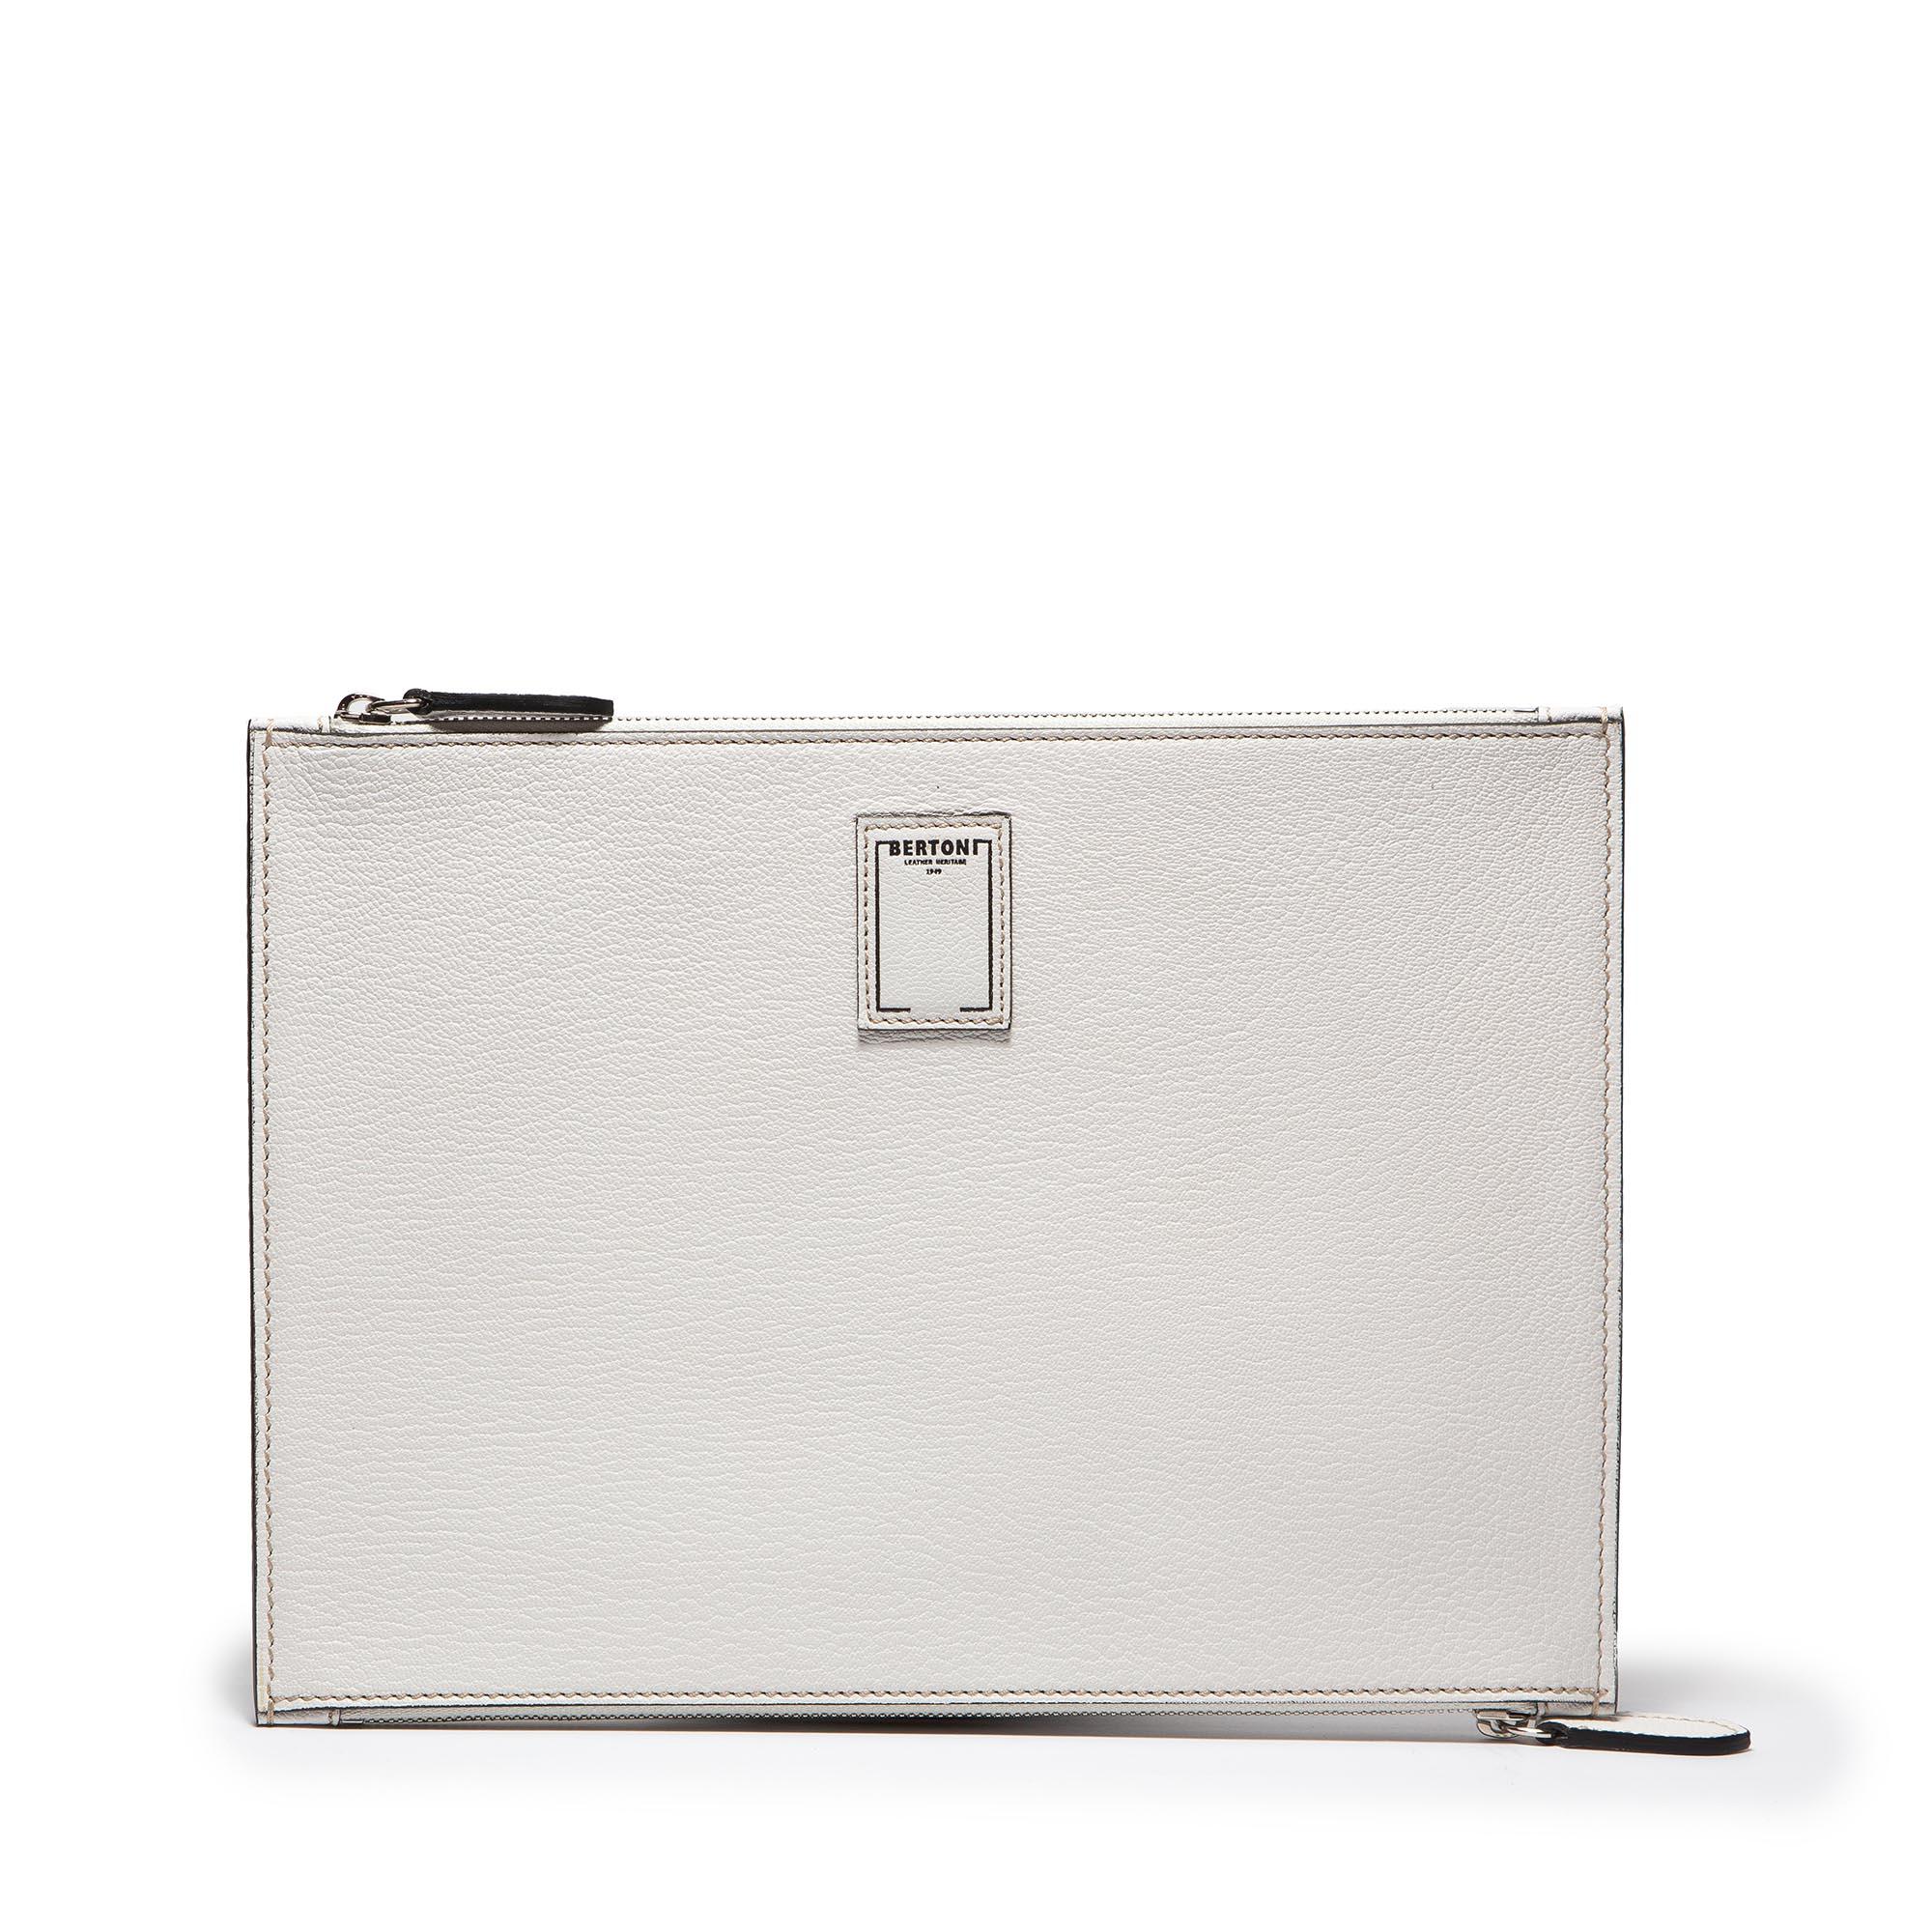 Double-Zipped-Pouch-ivory-goat-skin-bag-Bertoni-1949